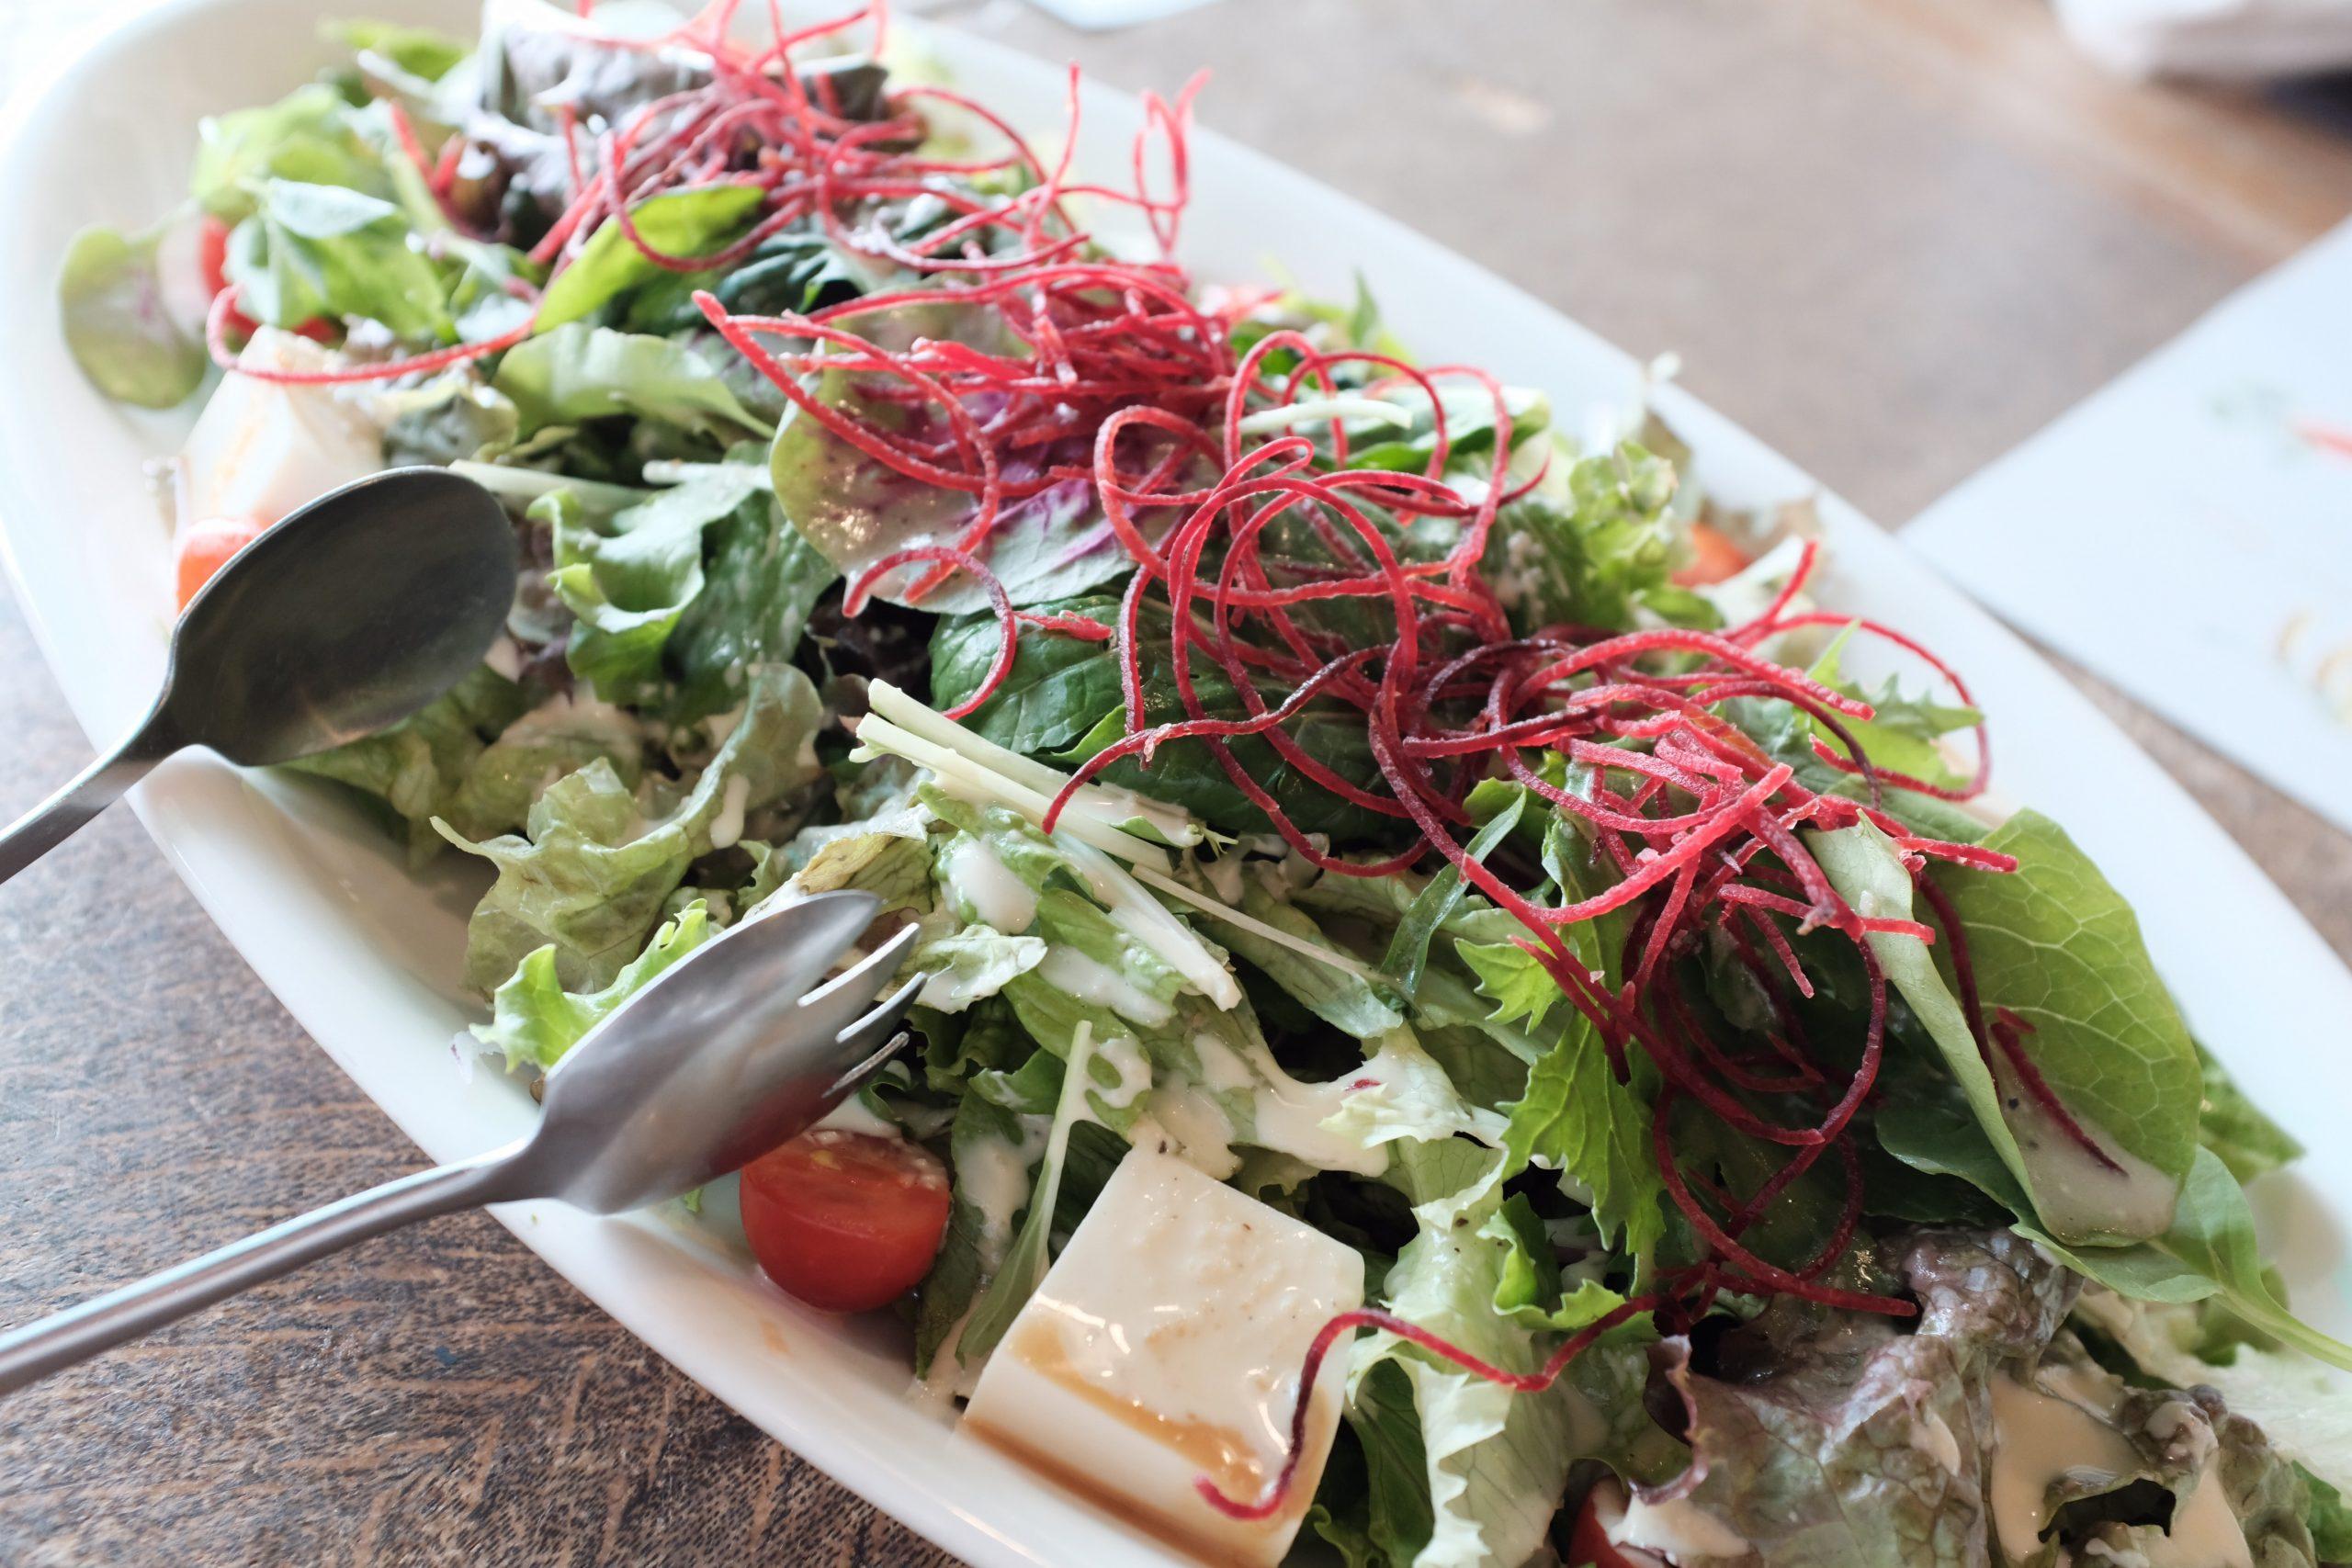 Salatbesteck